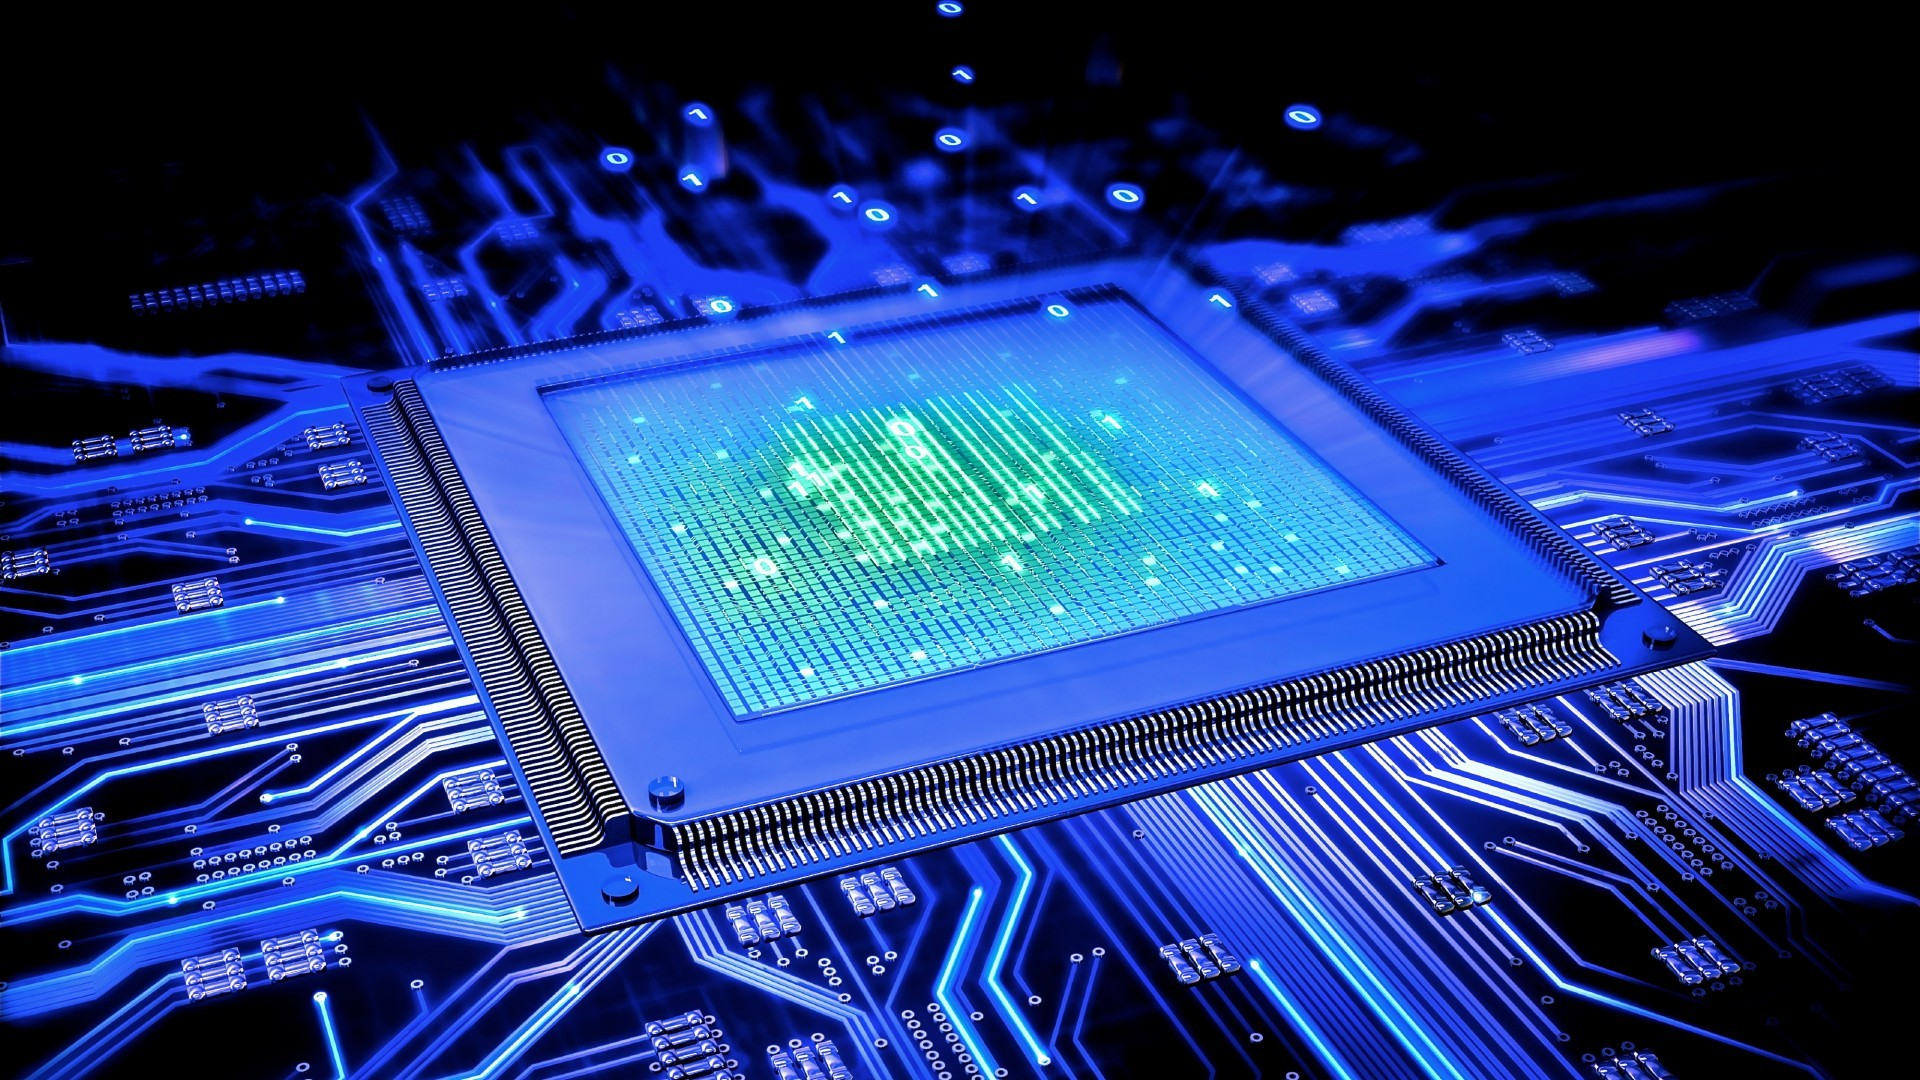 Processor CPU Motherboard Blue HD wallpaper   HD Latest Wallpapers